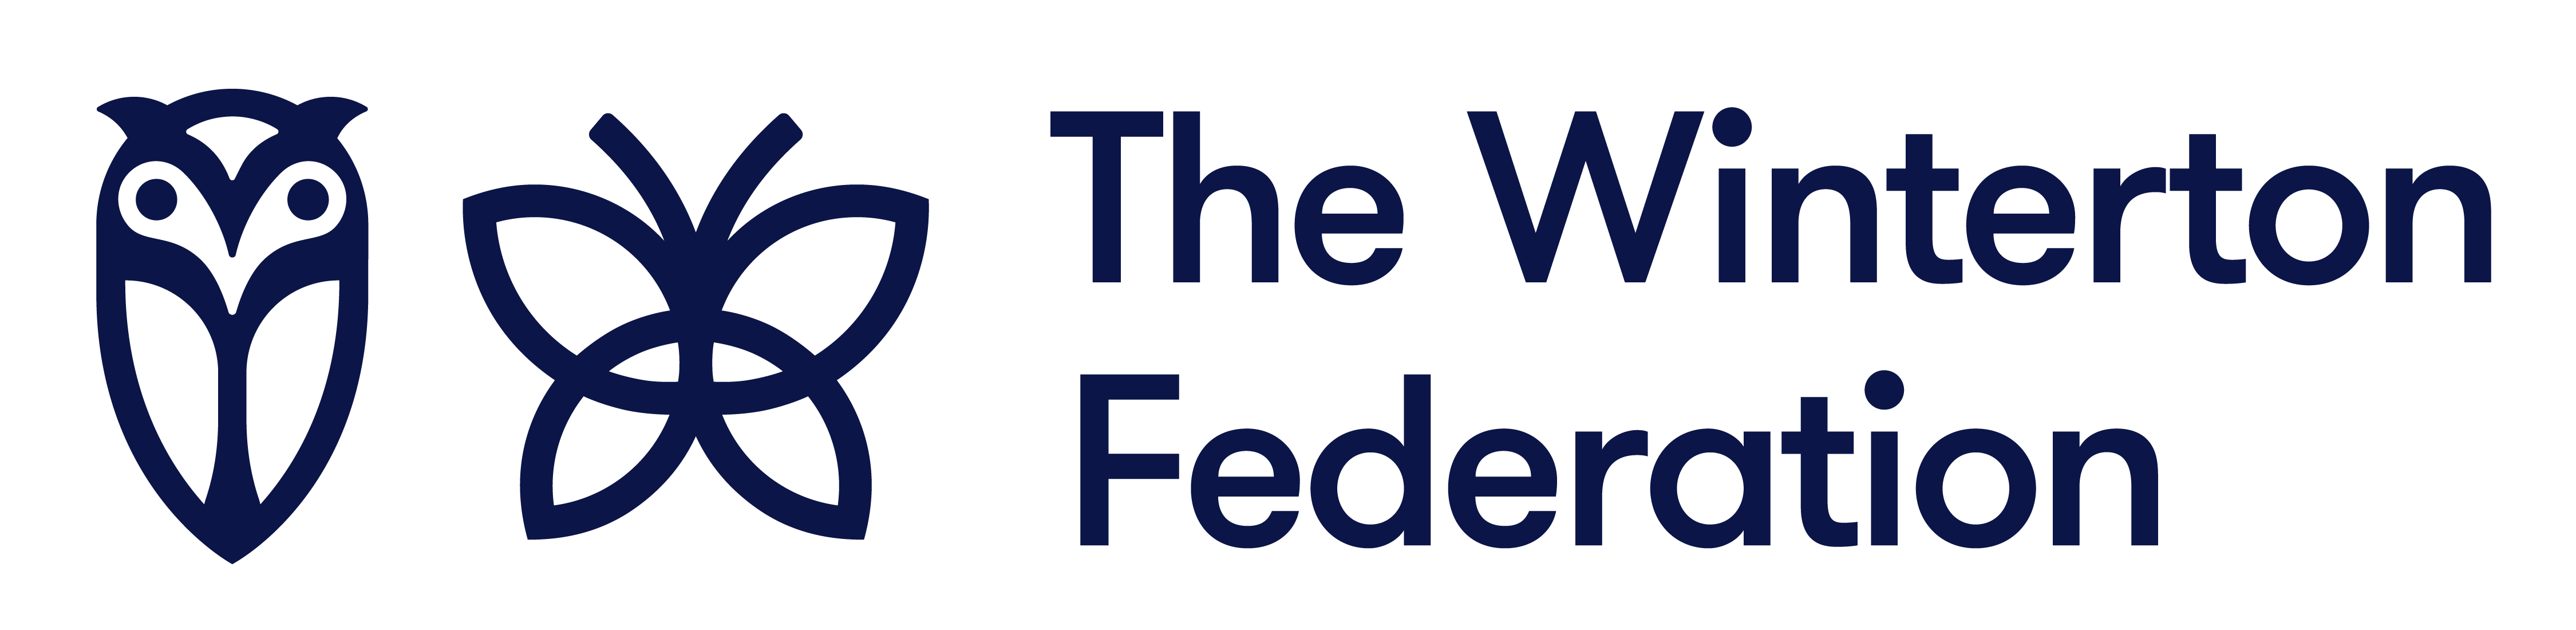 The Winterton Federation